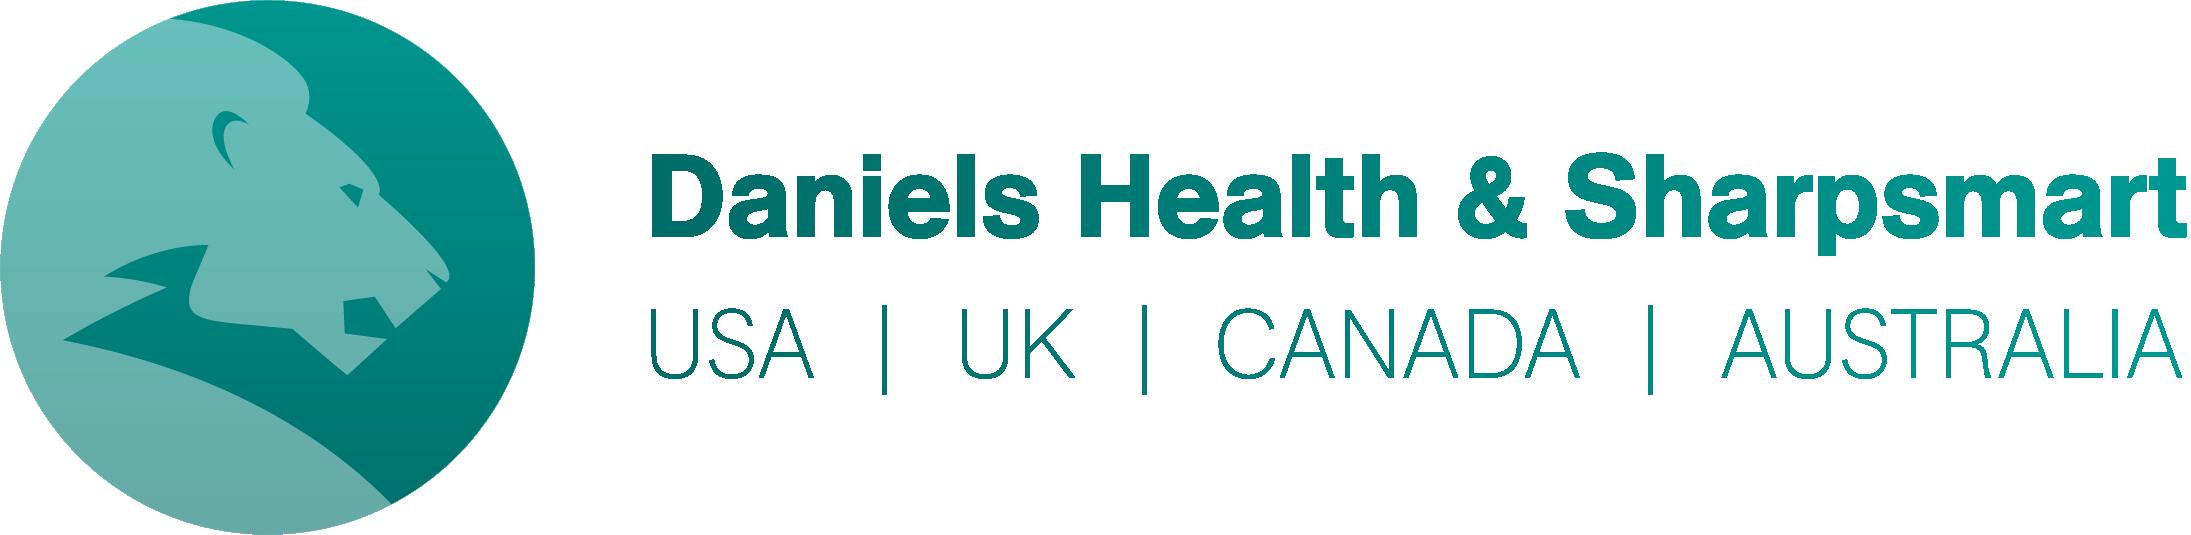 Daniels Health & Sharpsmart logo